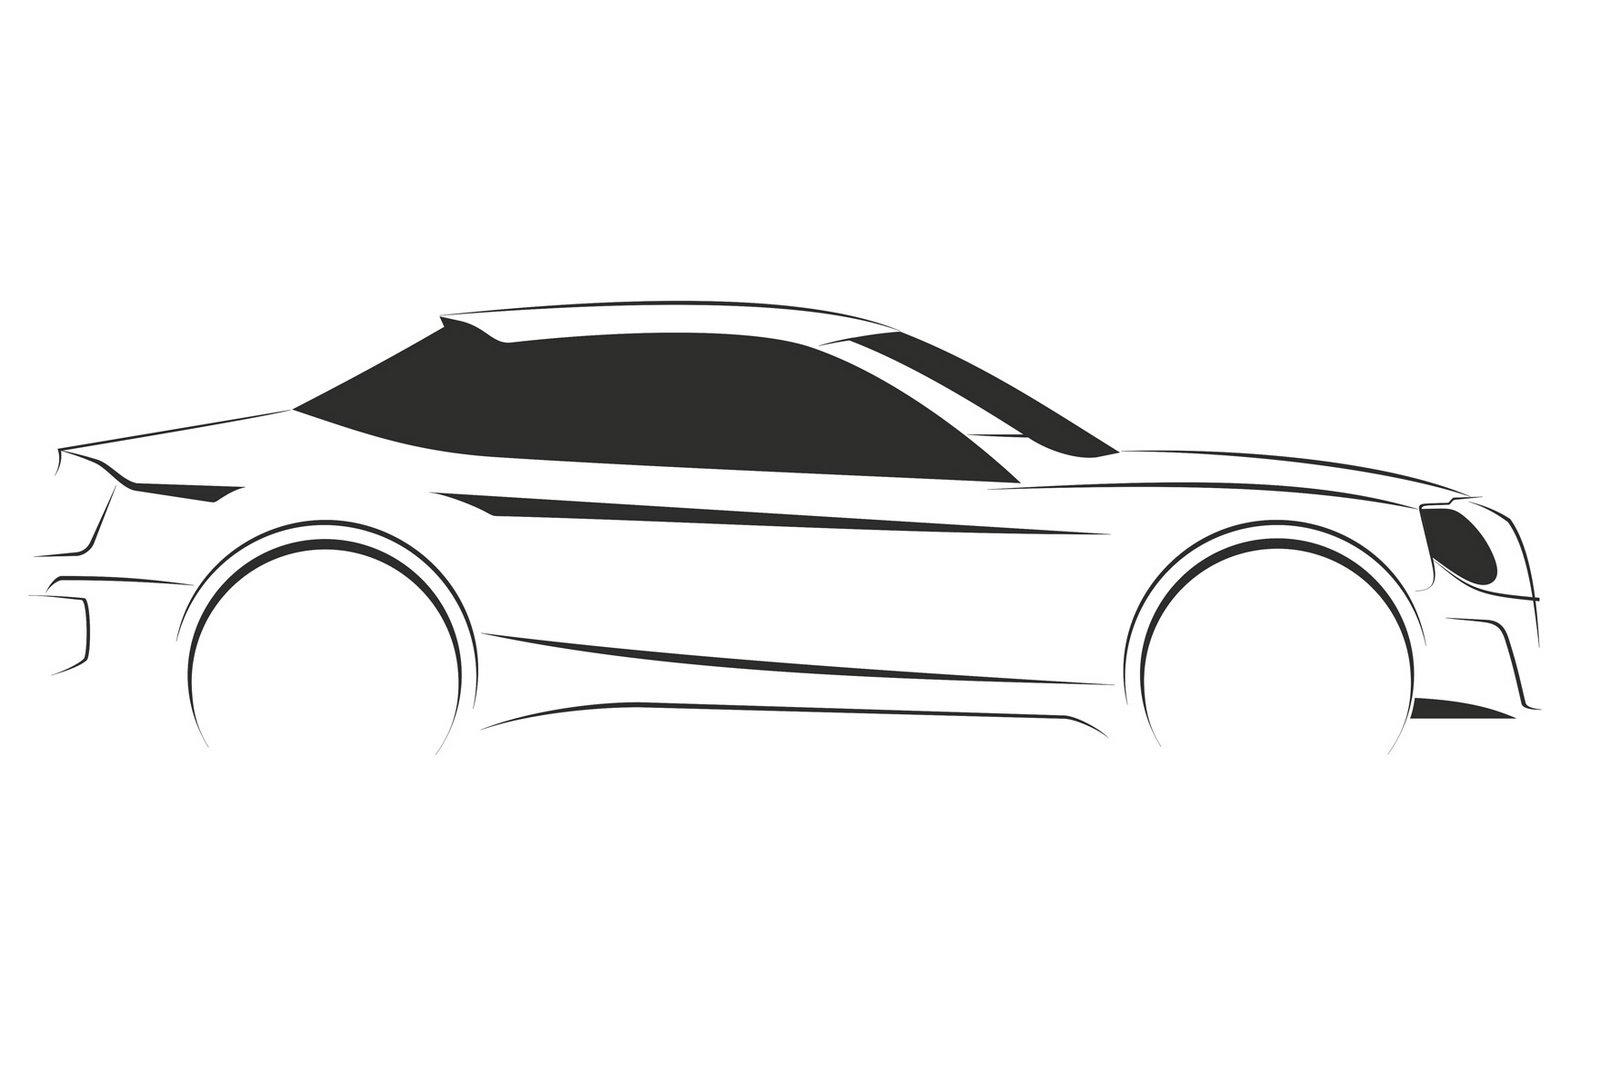 Prodan Dragos Alfa Romeo Giulia Concept Is One Mean